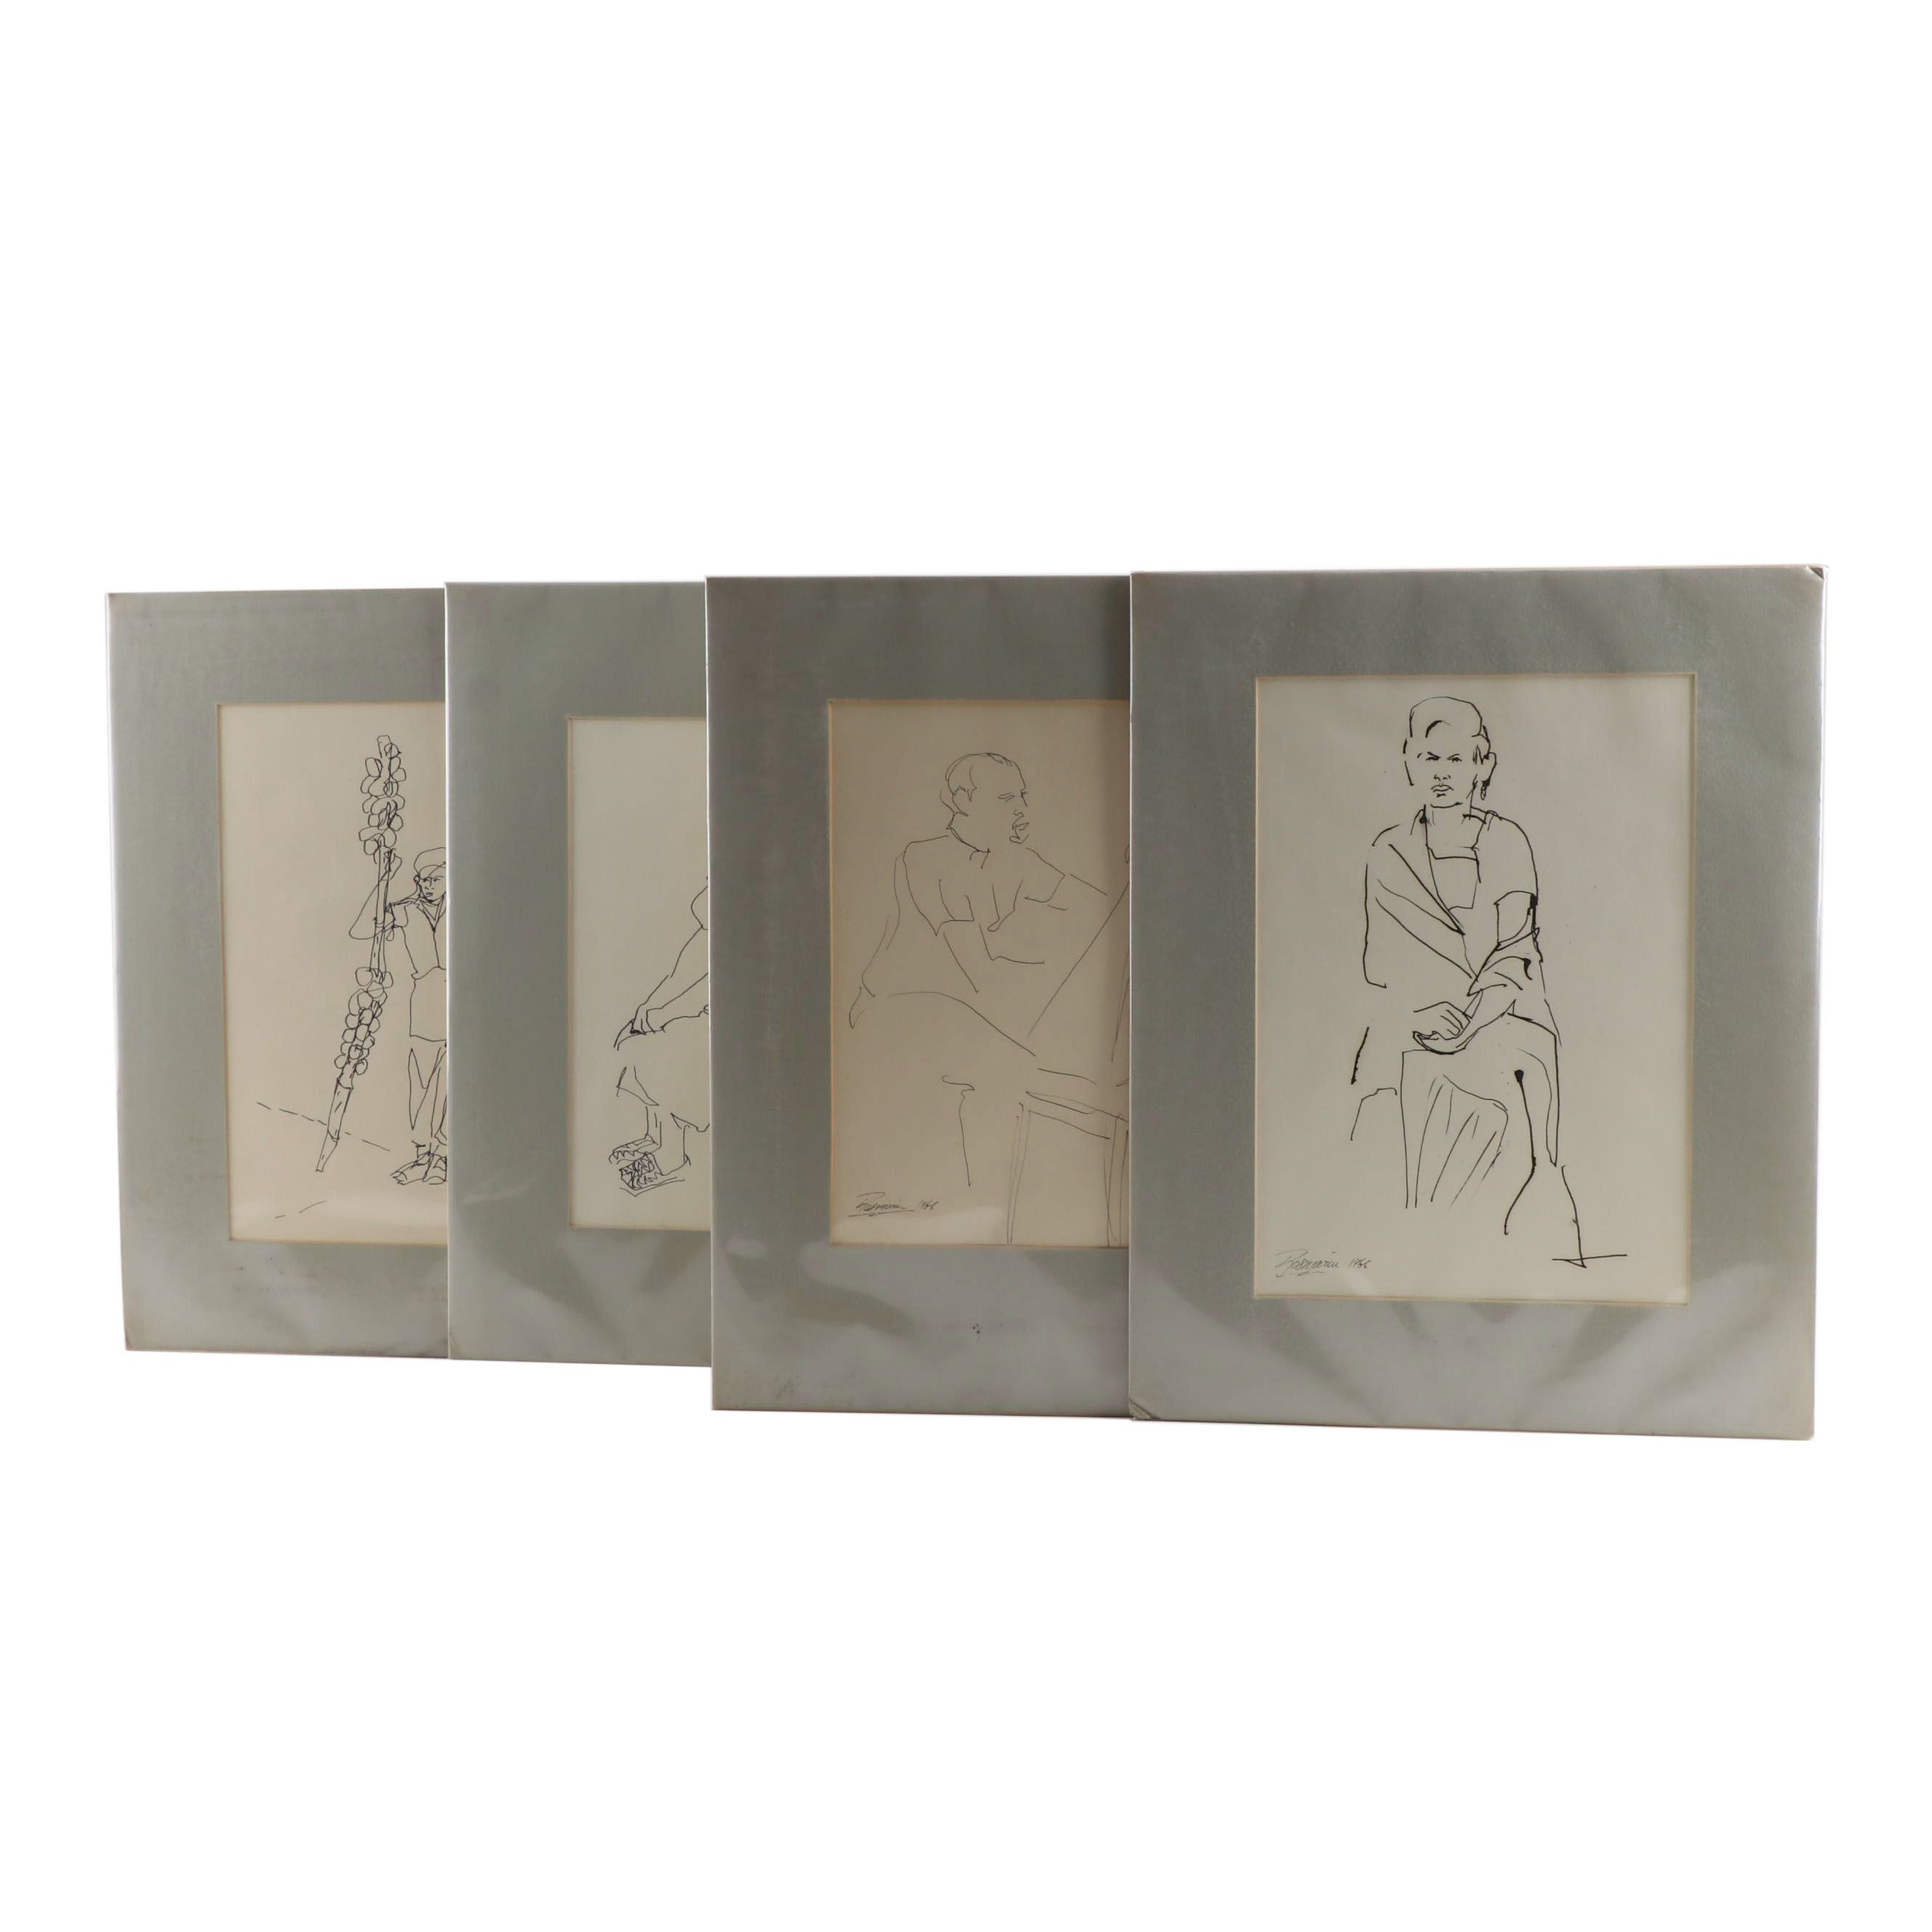 Richard Rosmarin Figural Drawings, 1960s